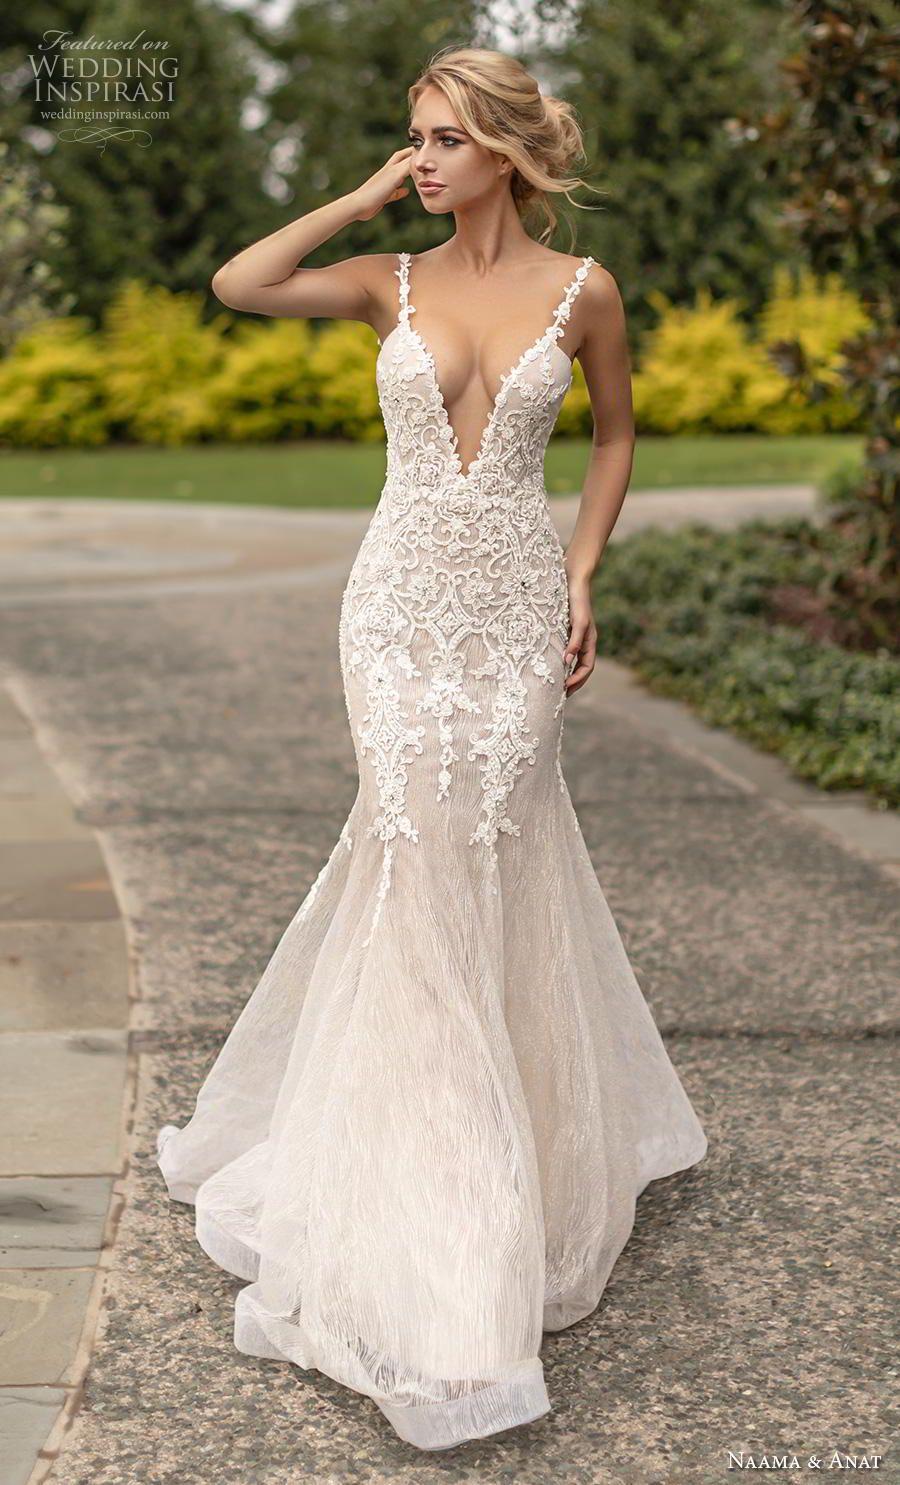 Elegant fitted wedding dresses  Naama u Anat Couture Wedding Dresses Fall   Wedding dresses